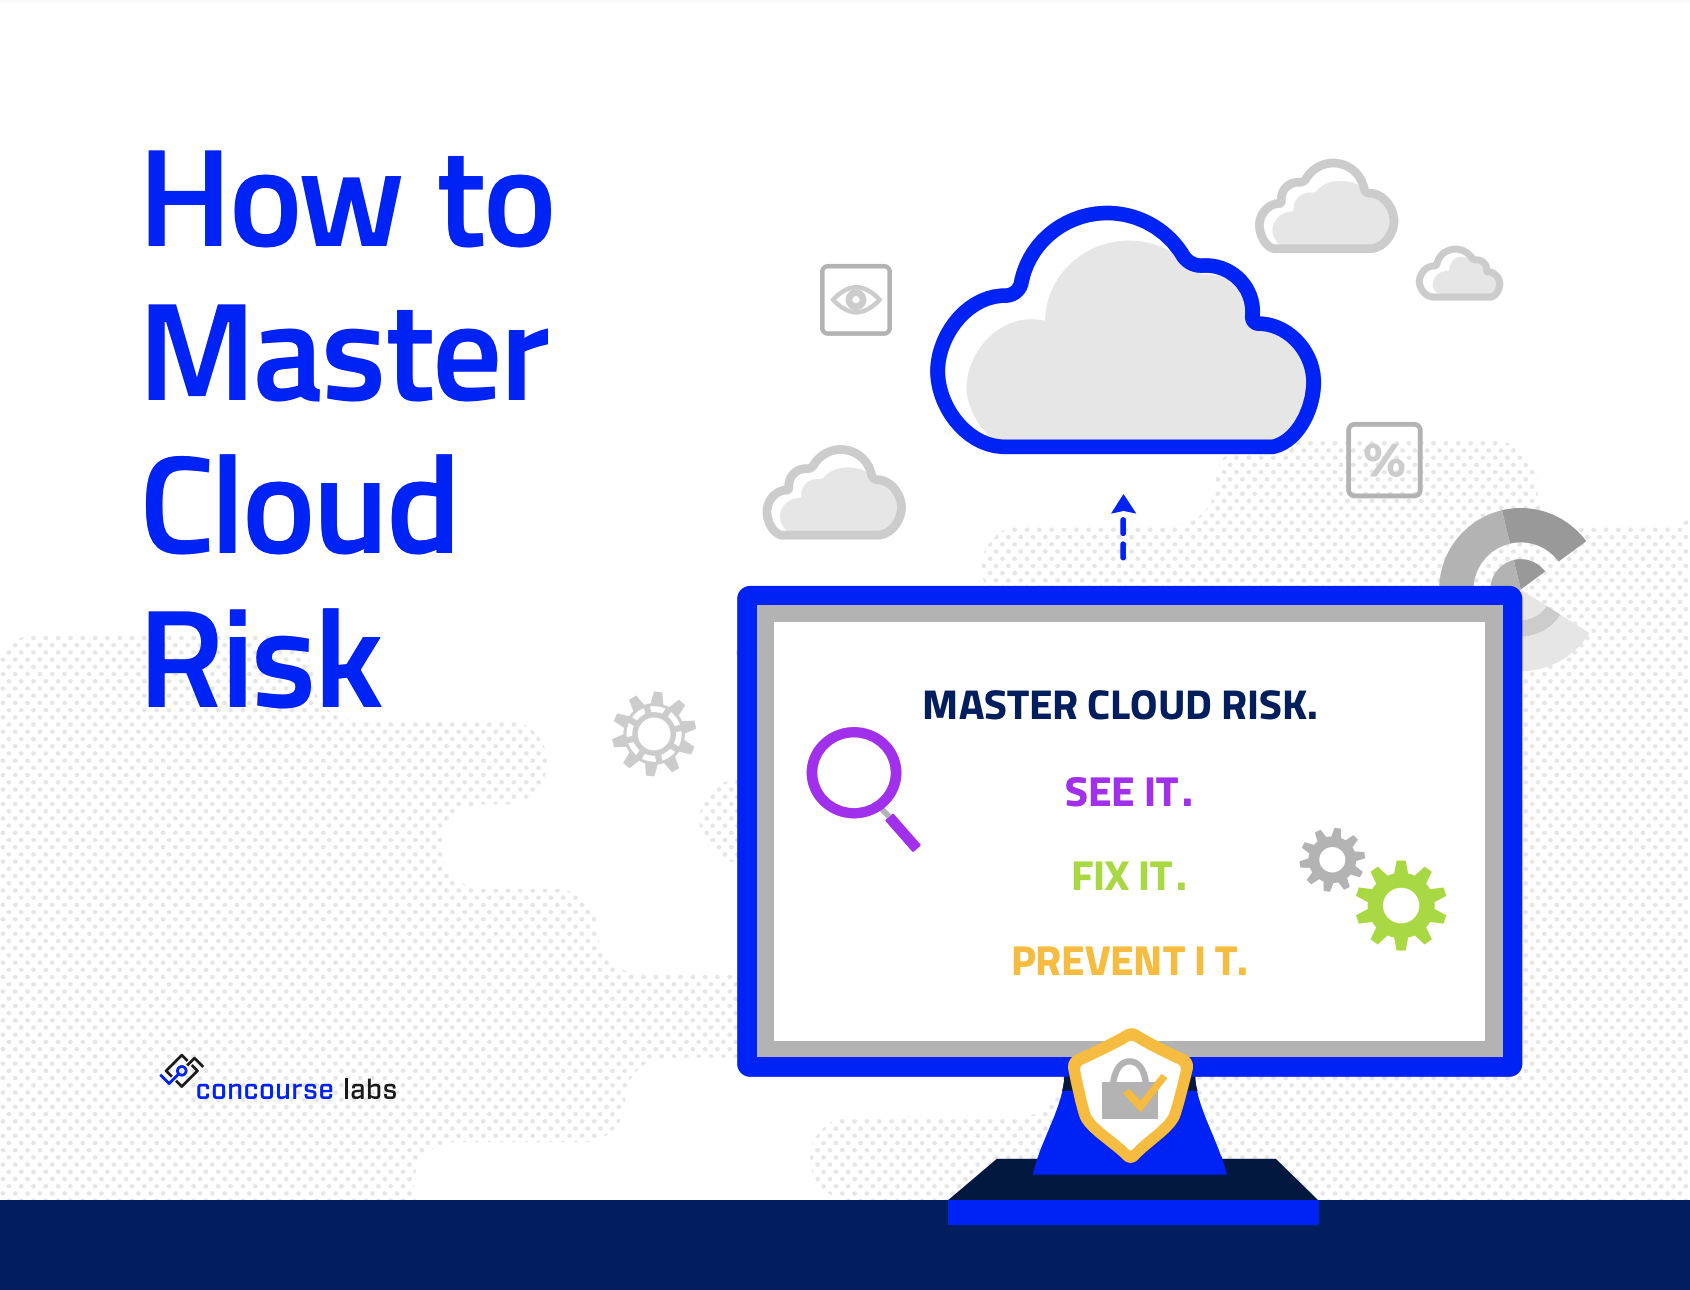 Master Cloud Risk